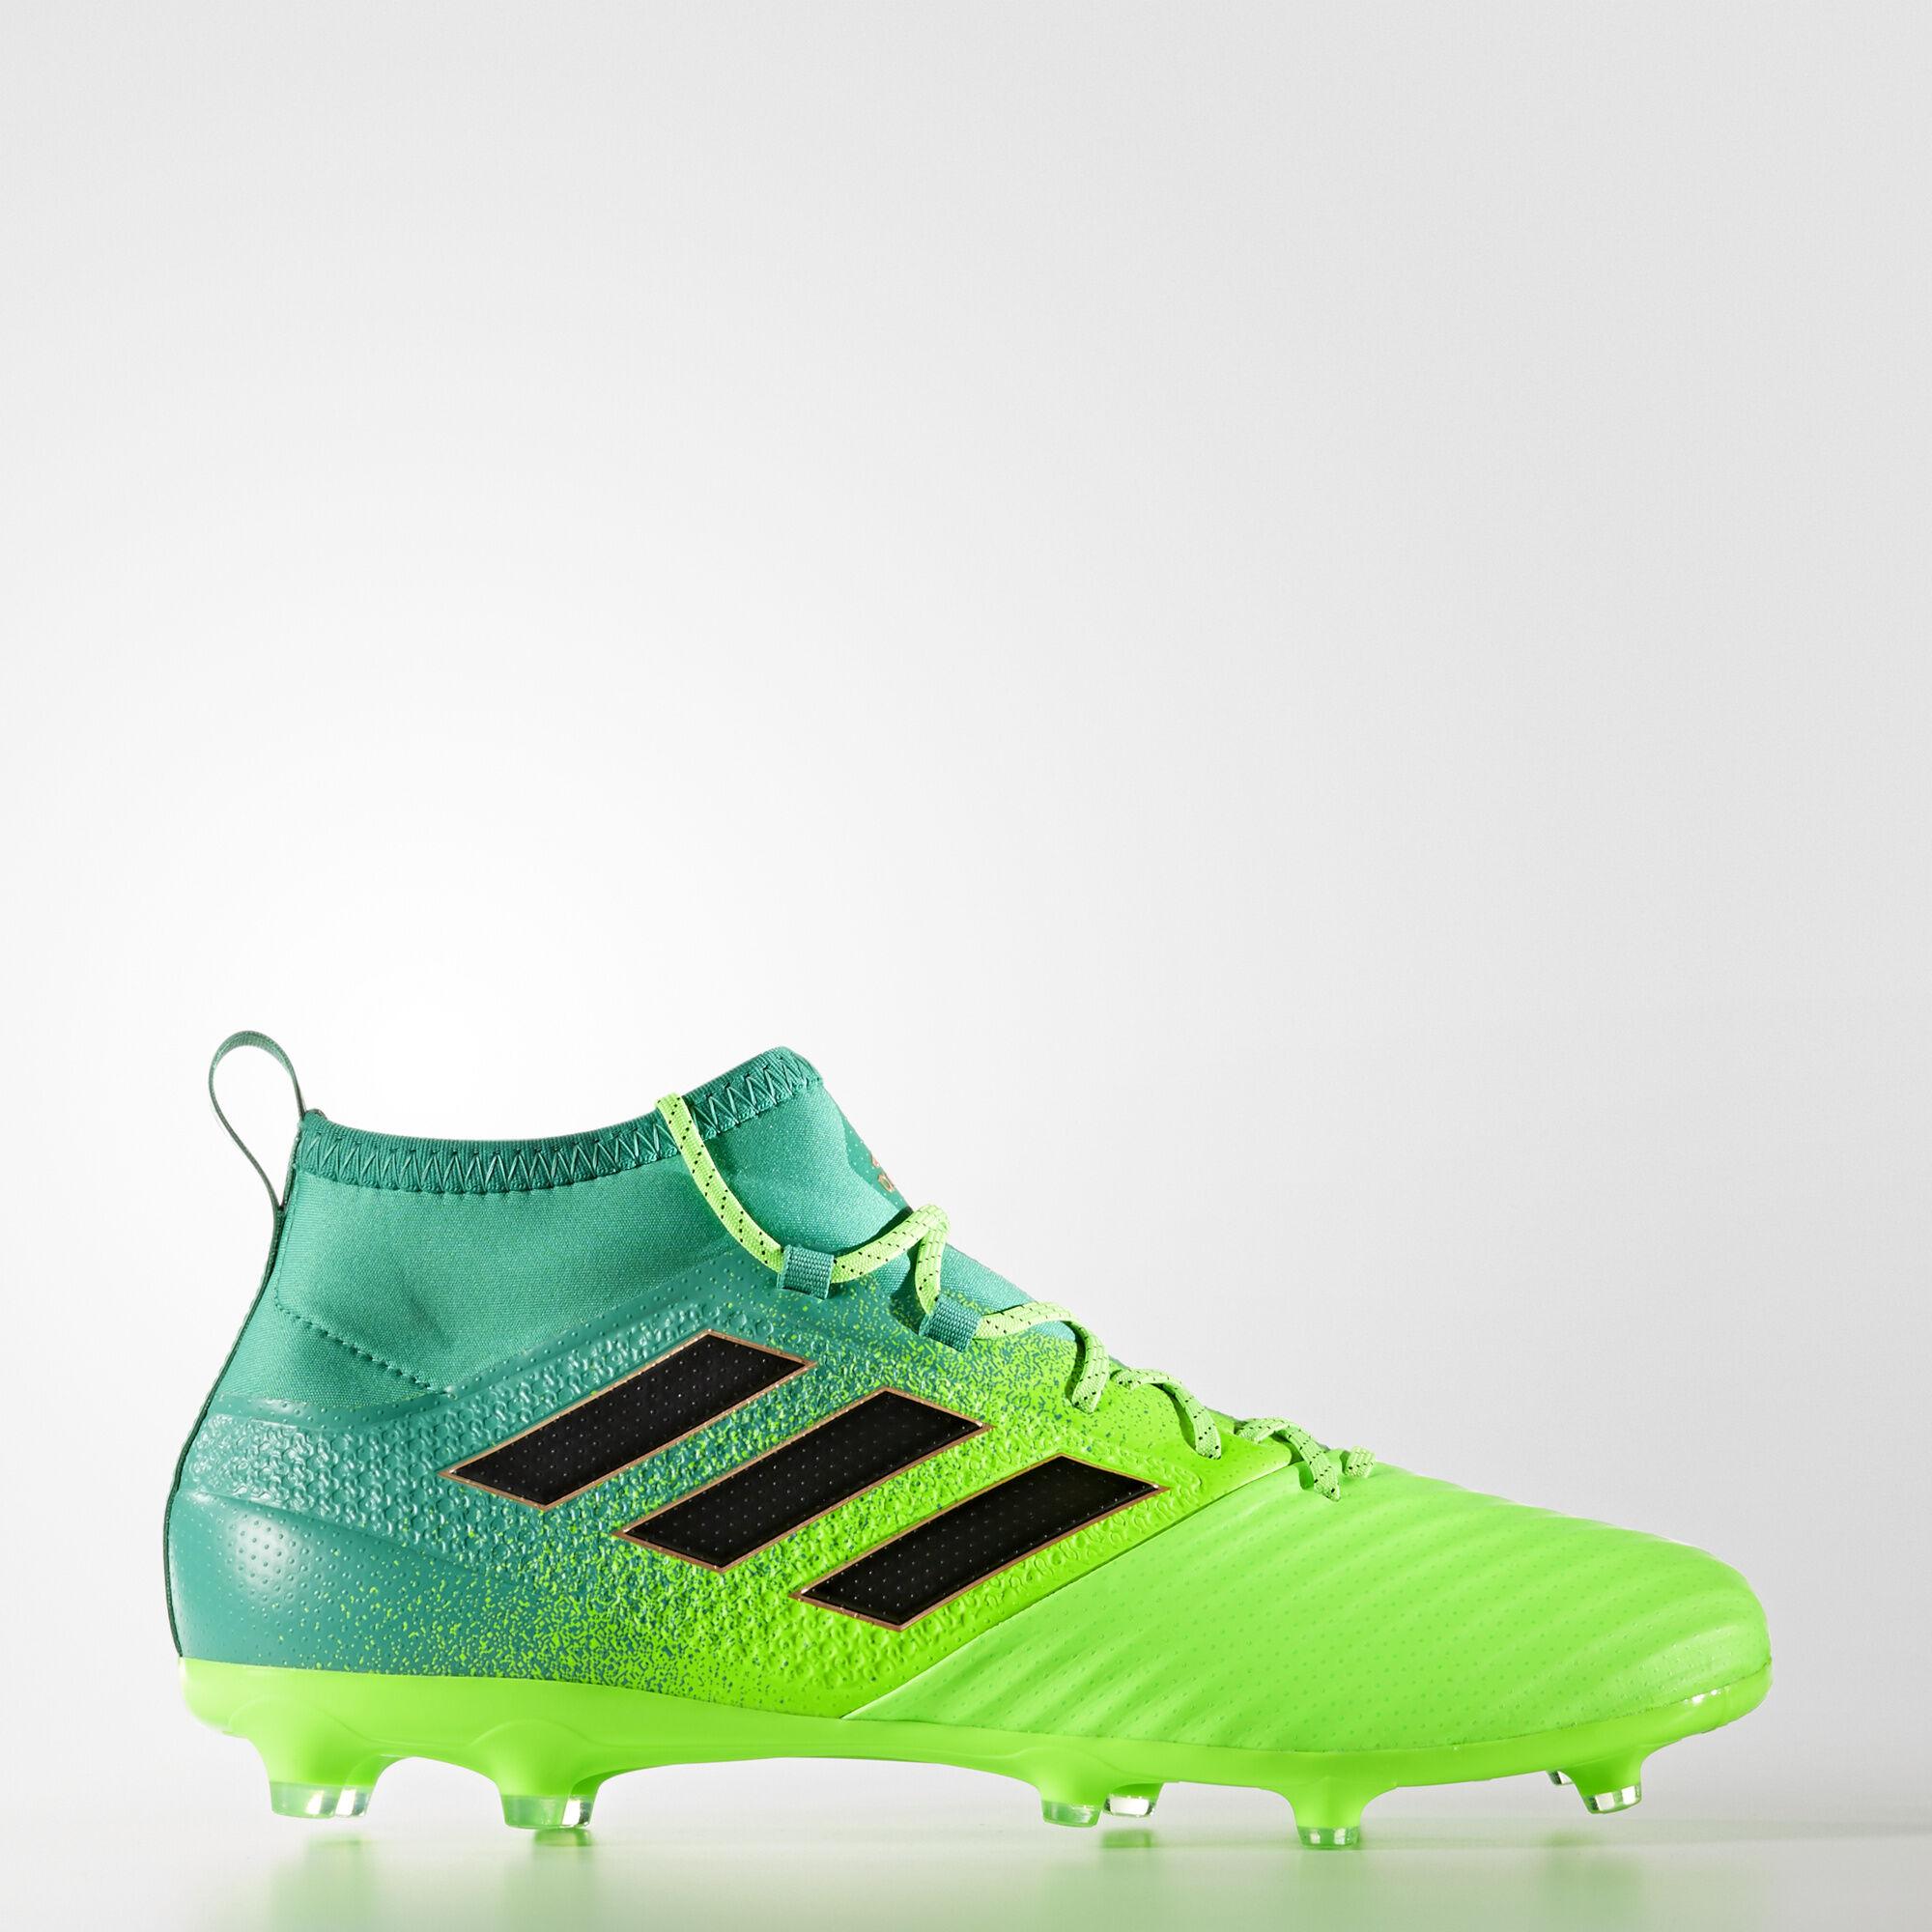 Adidas Futbol Botines